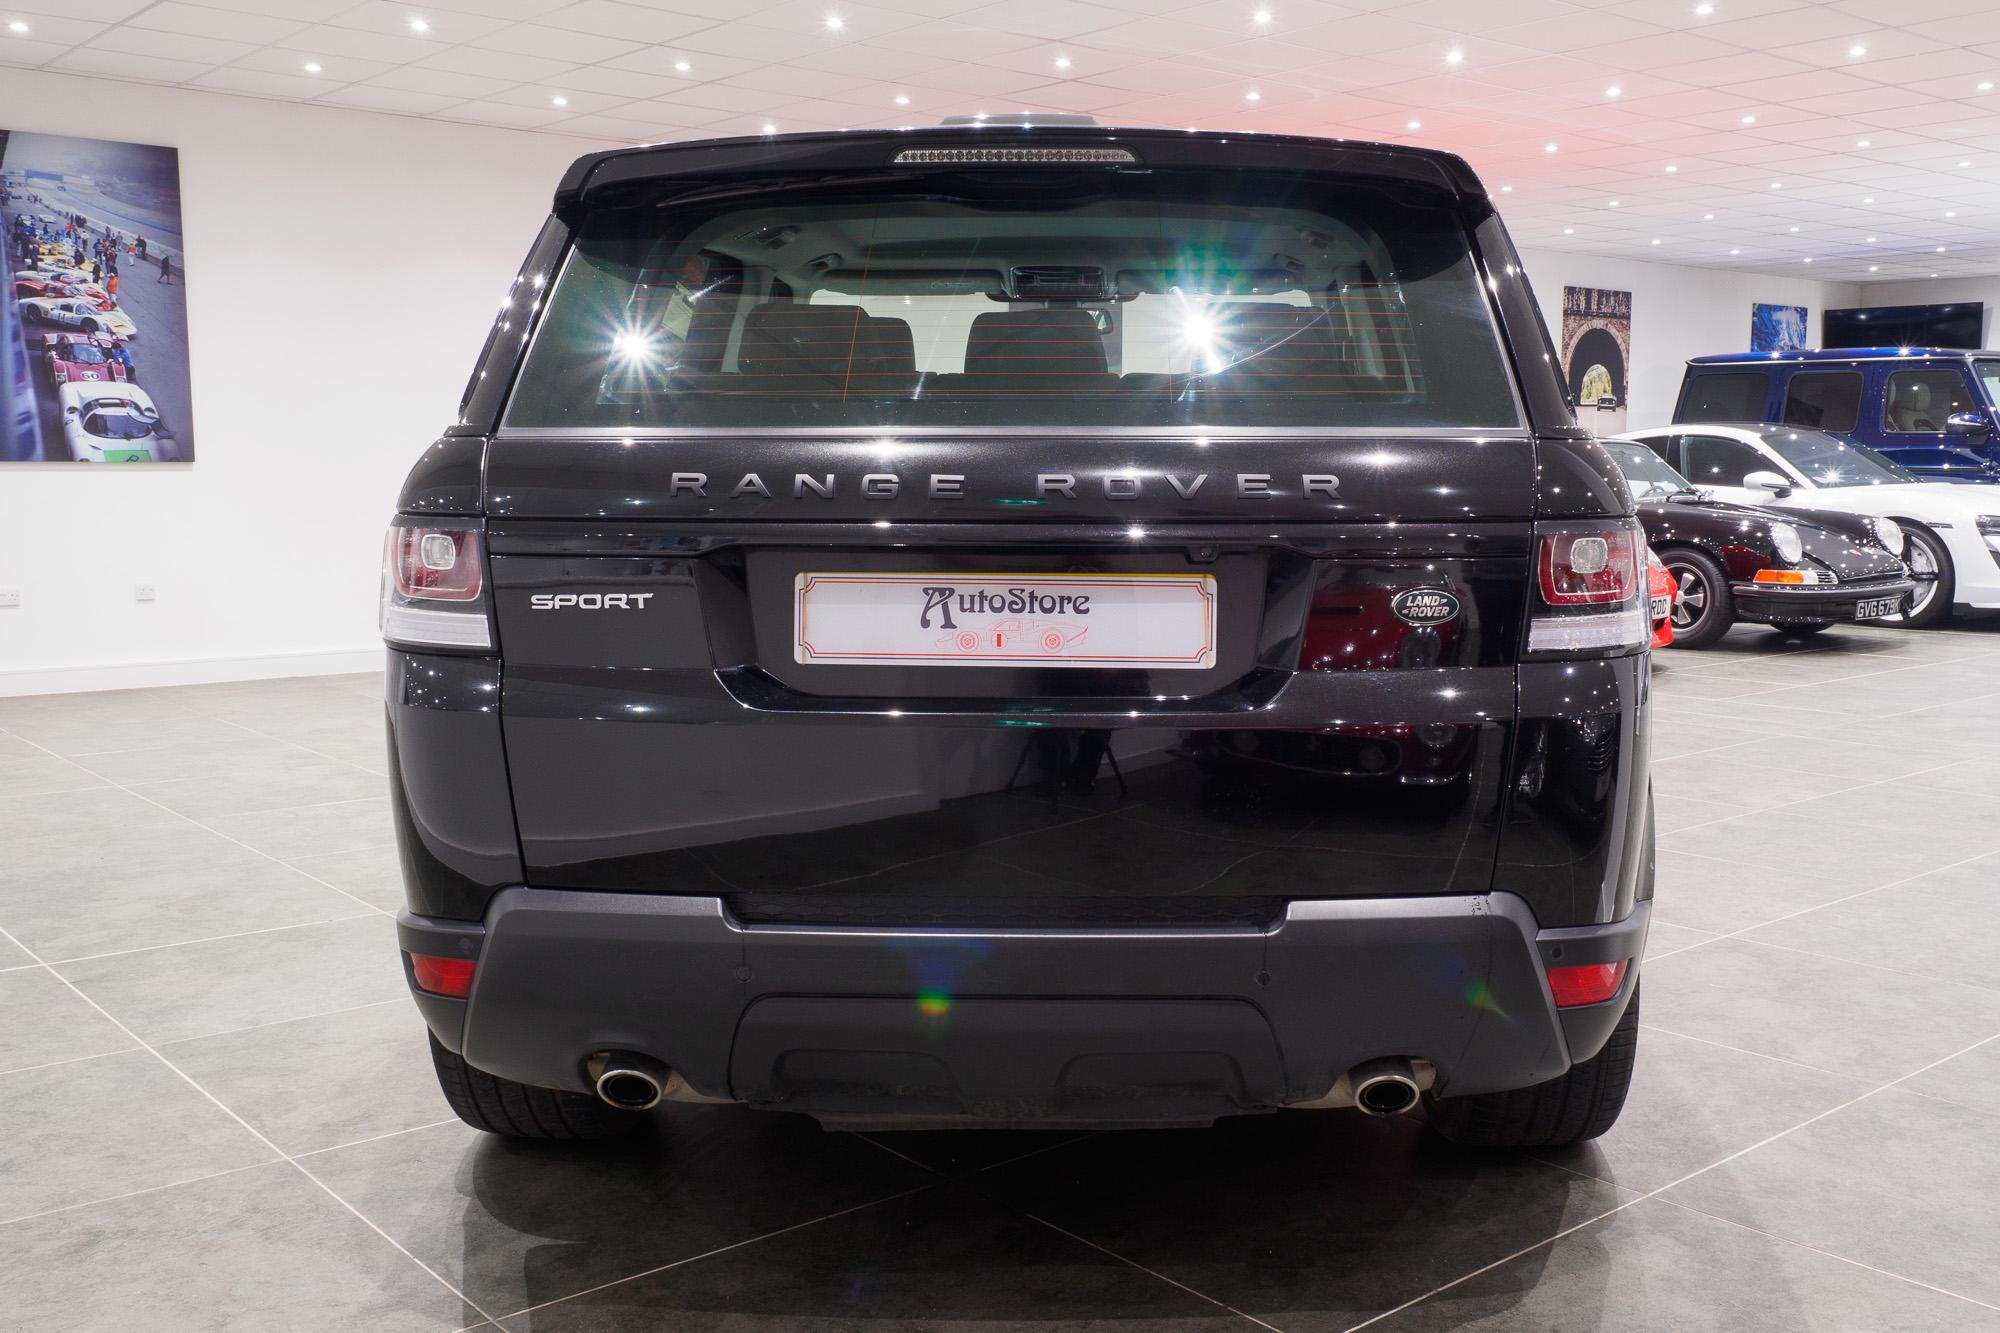 Range Rover Sport-3